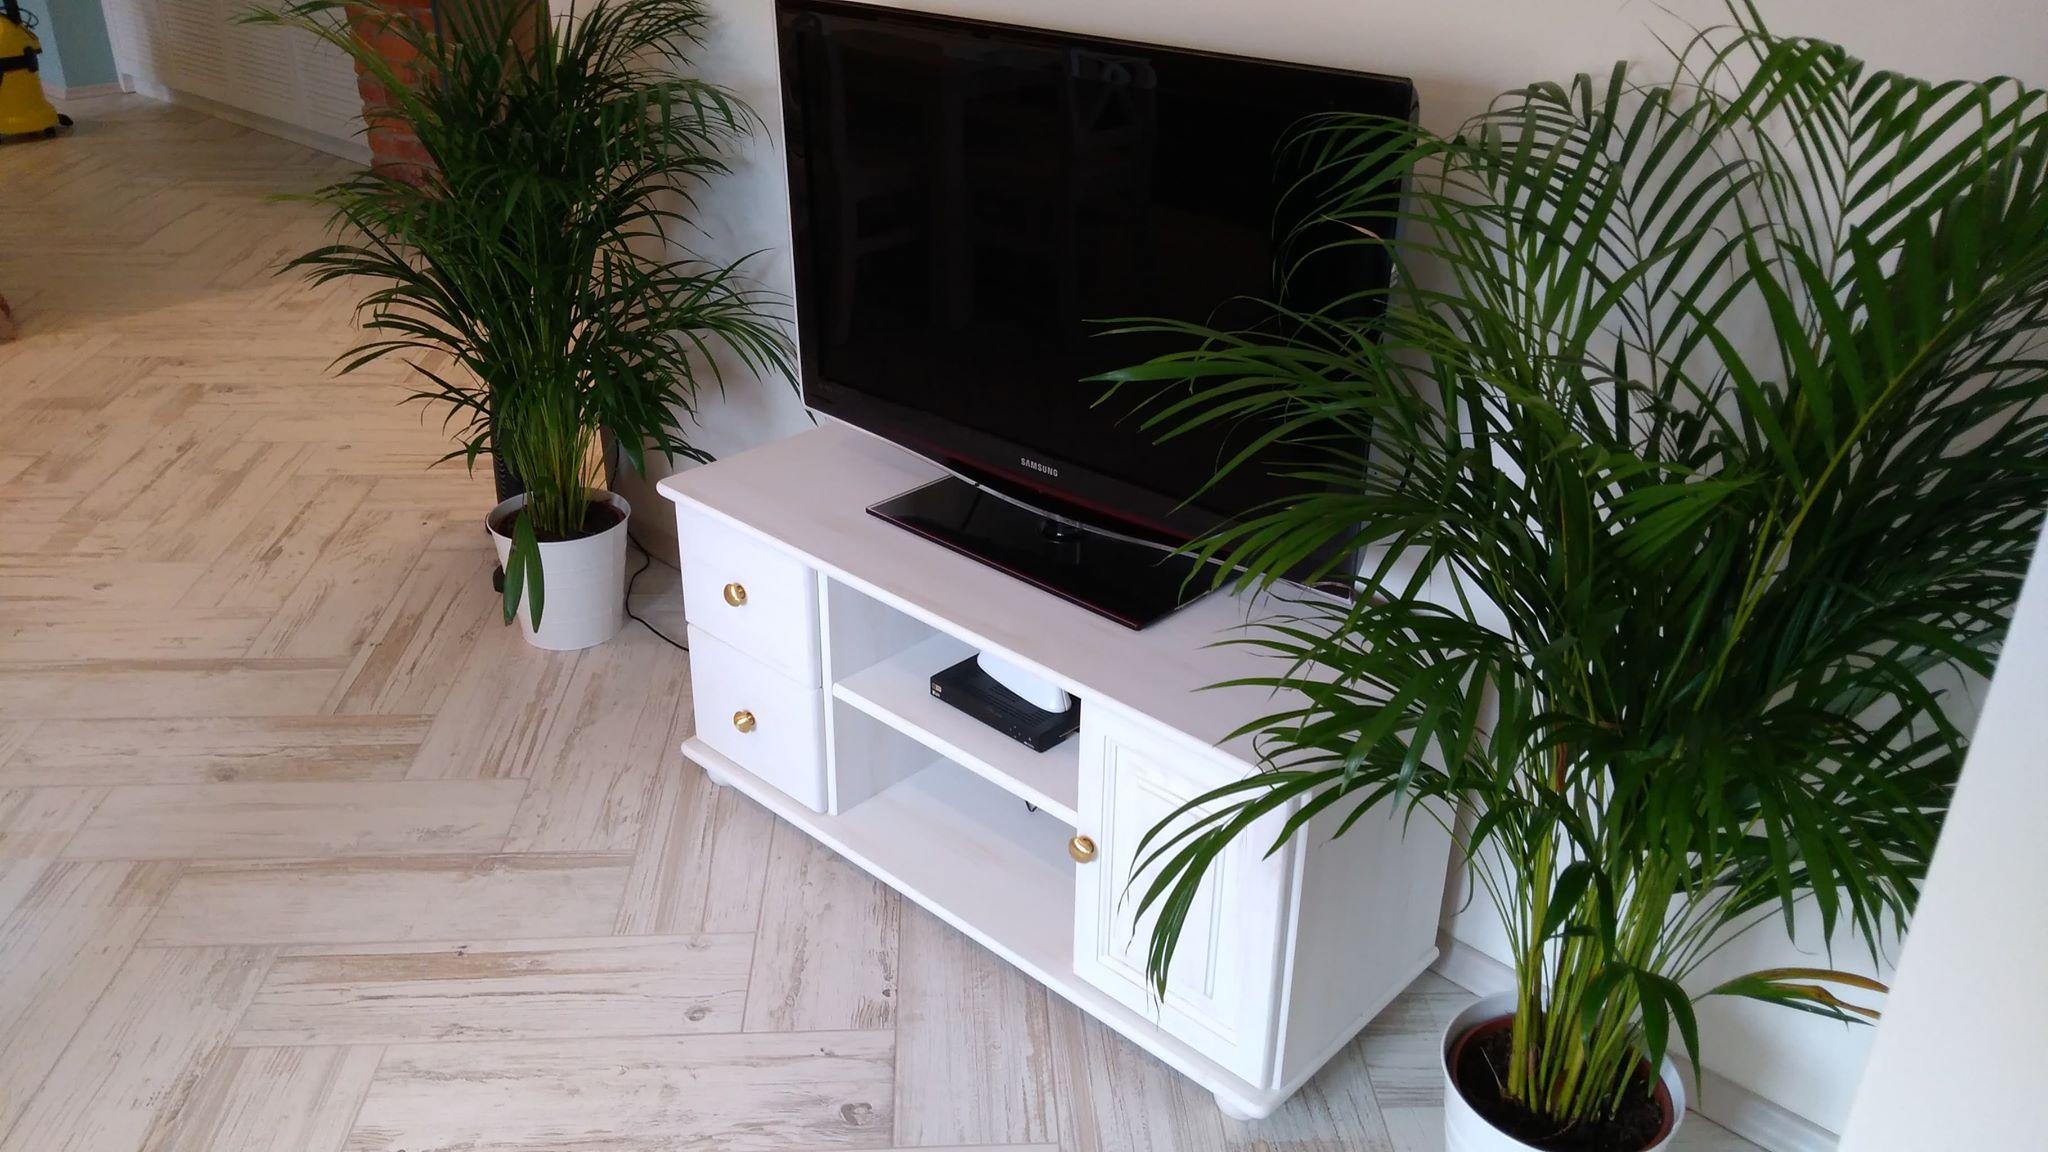 biała szafka pod telewizor